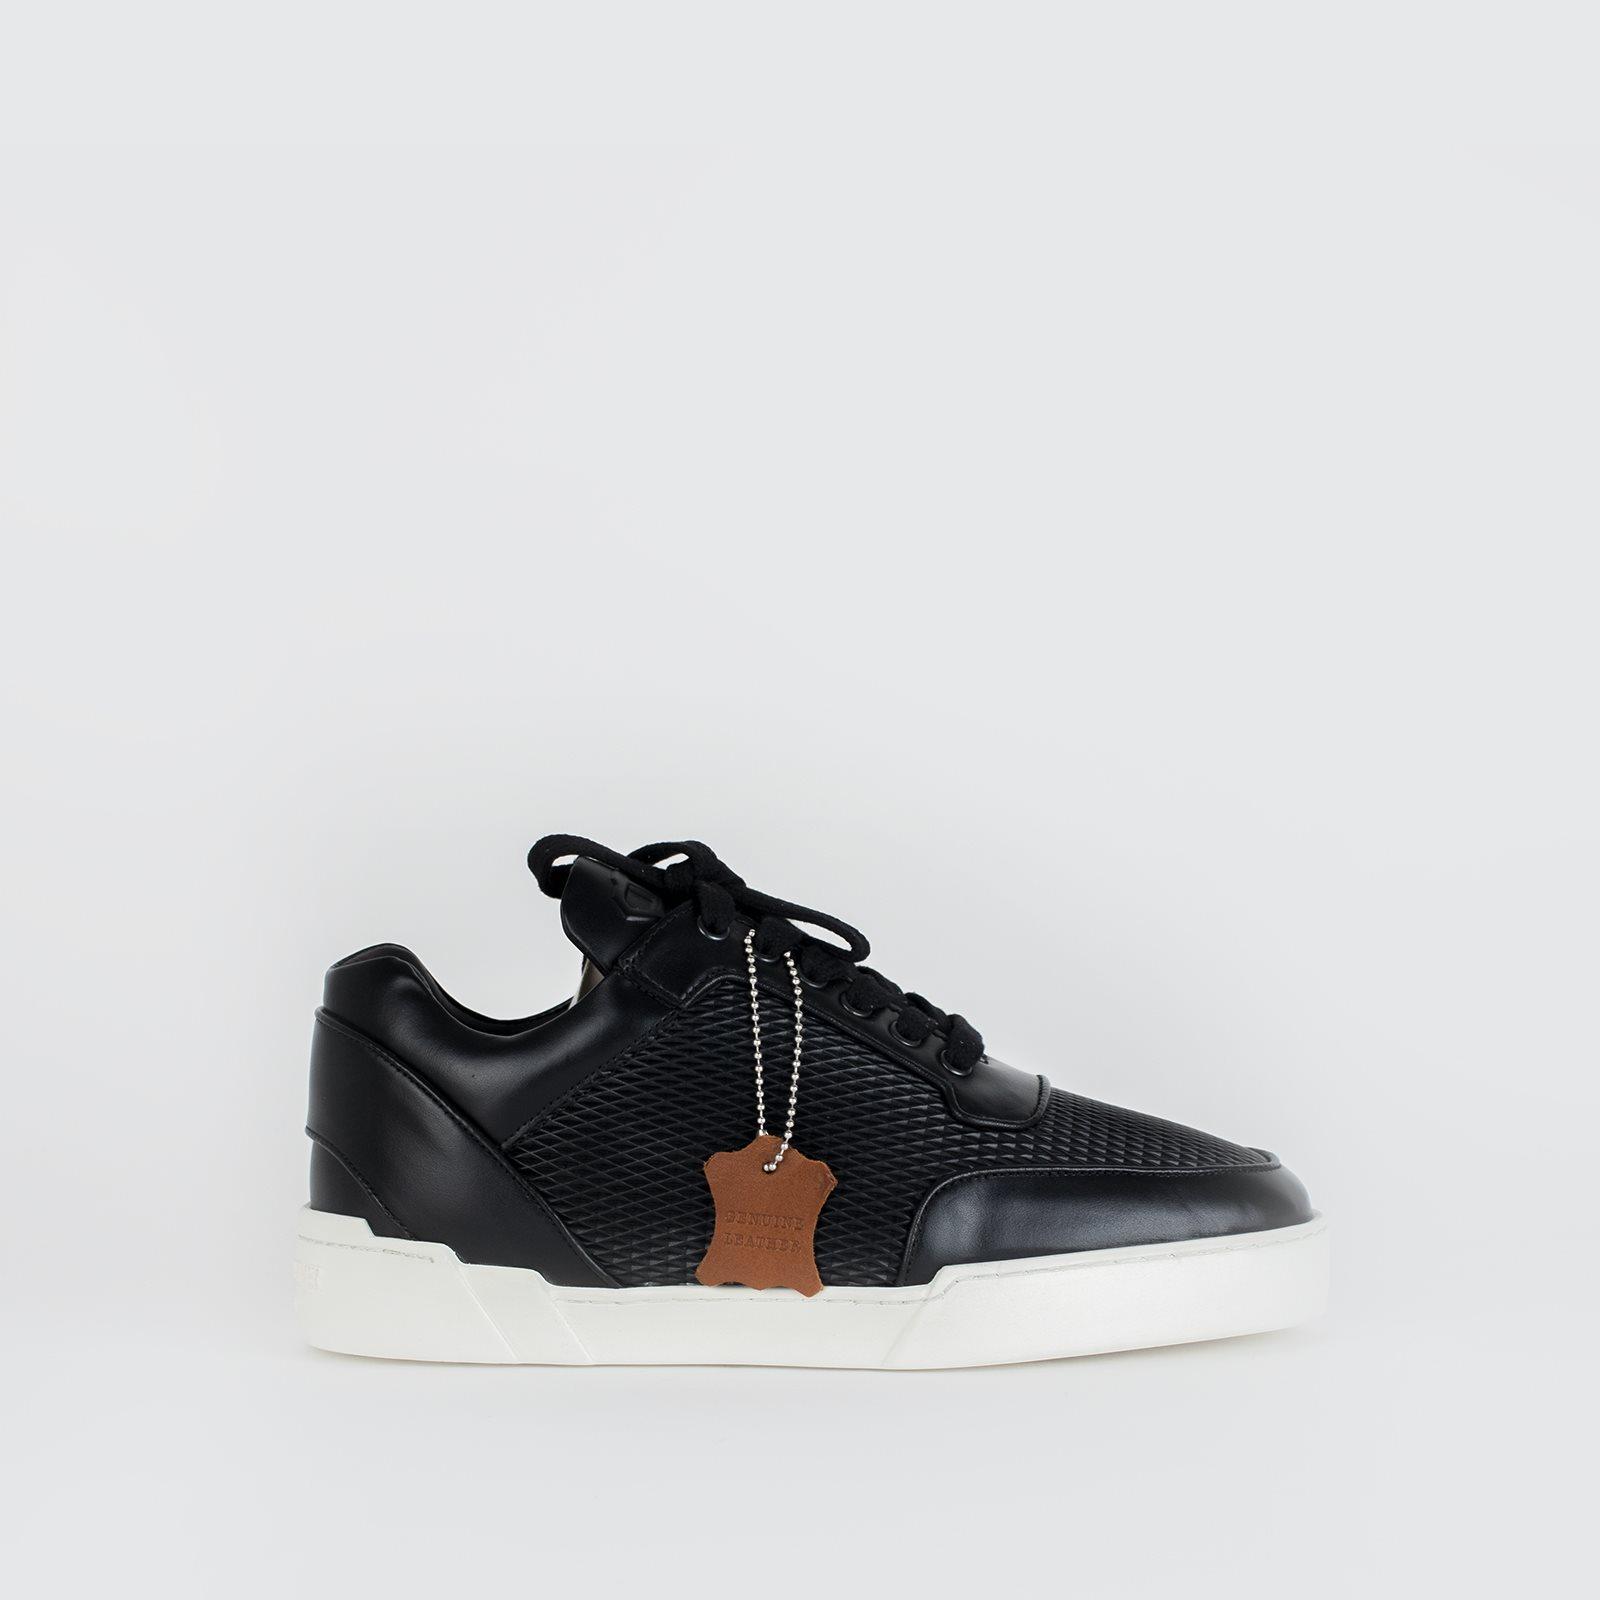 c6db19483e0 Benjamin Berner Sneaker ...